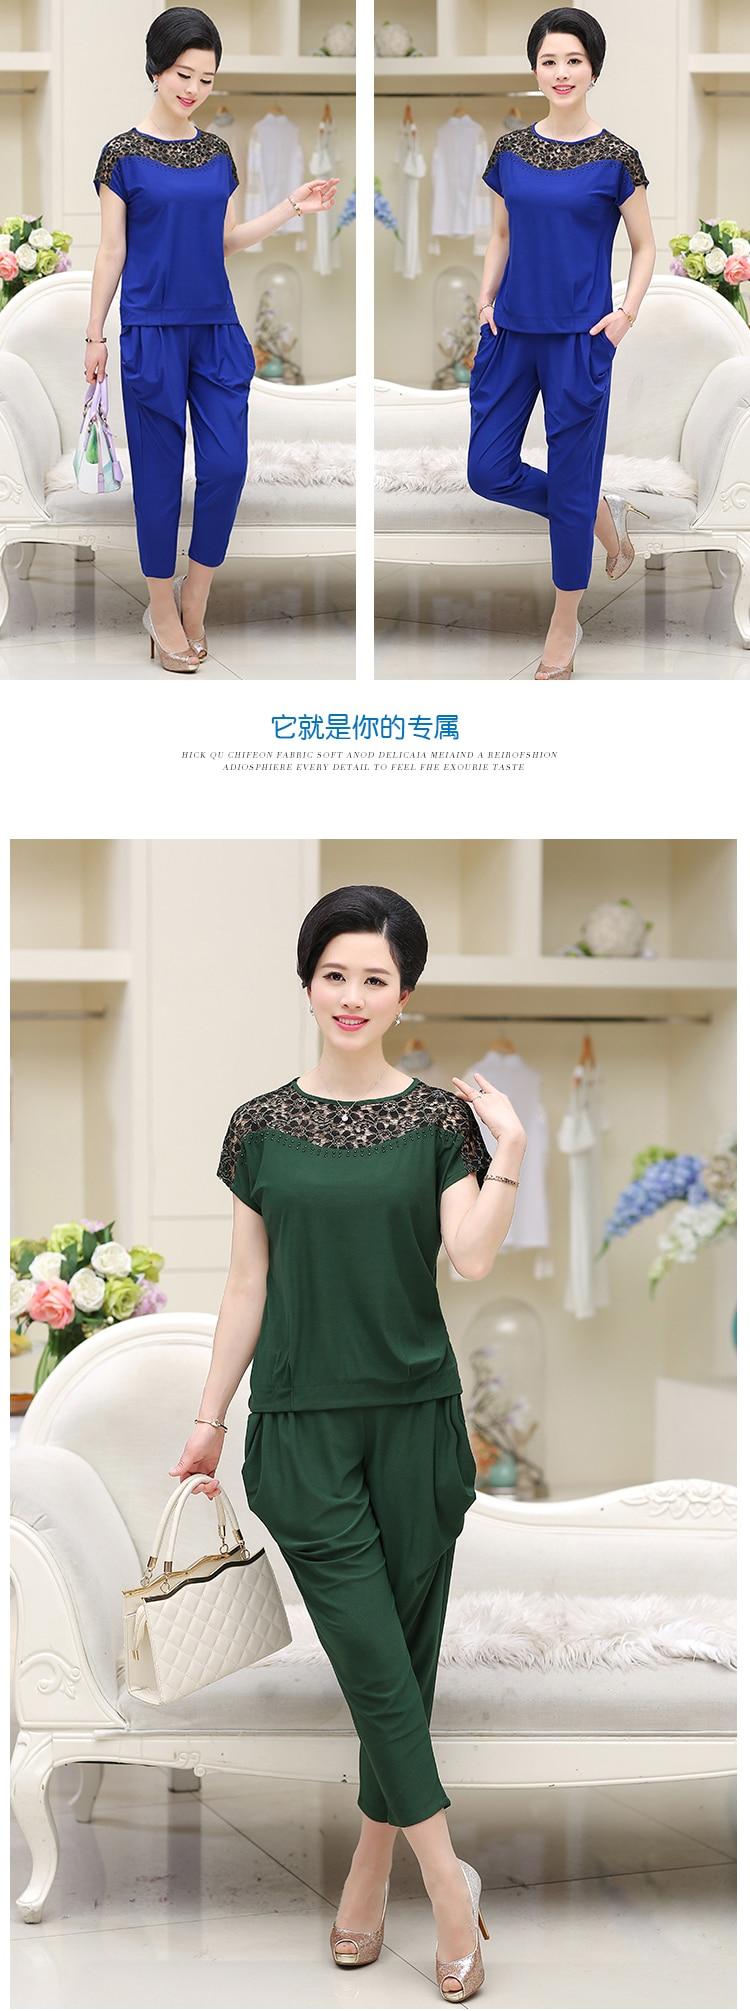 2019 Summer New Middle-Aged Women Lace Suit Set Short-Sleeved O- Neck Fashion Women Set W478 7